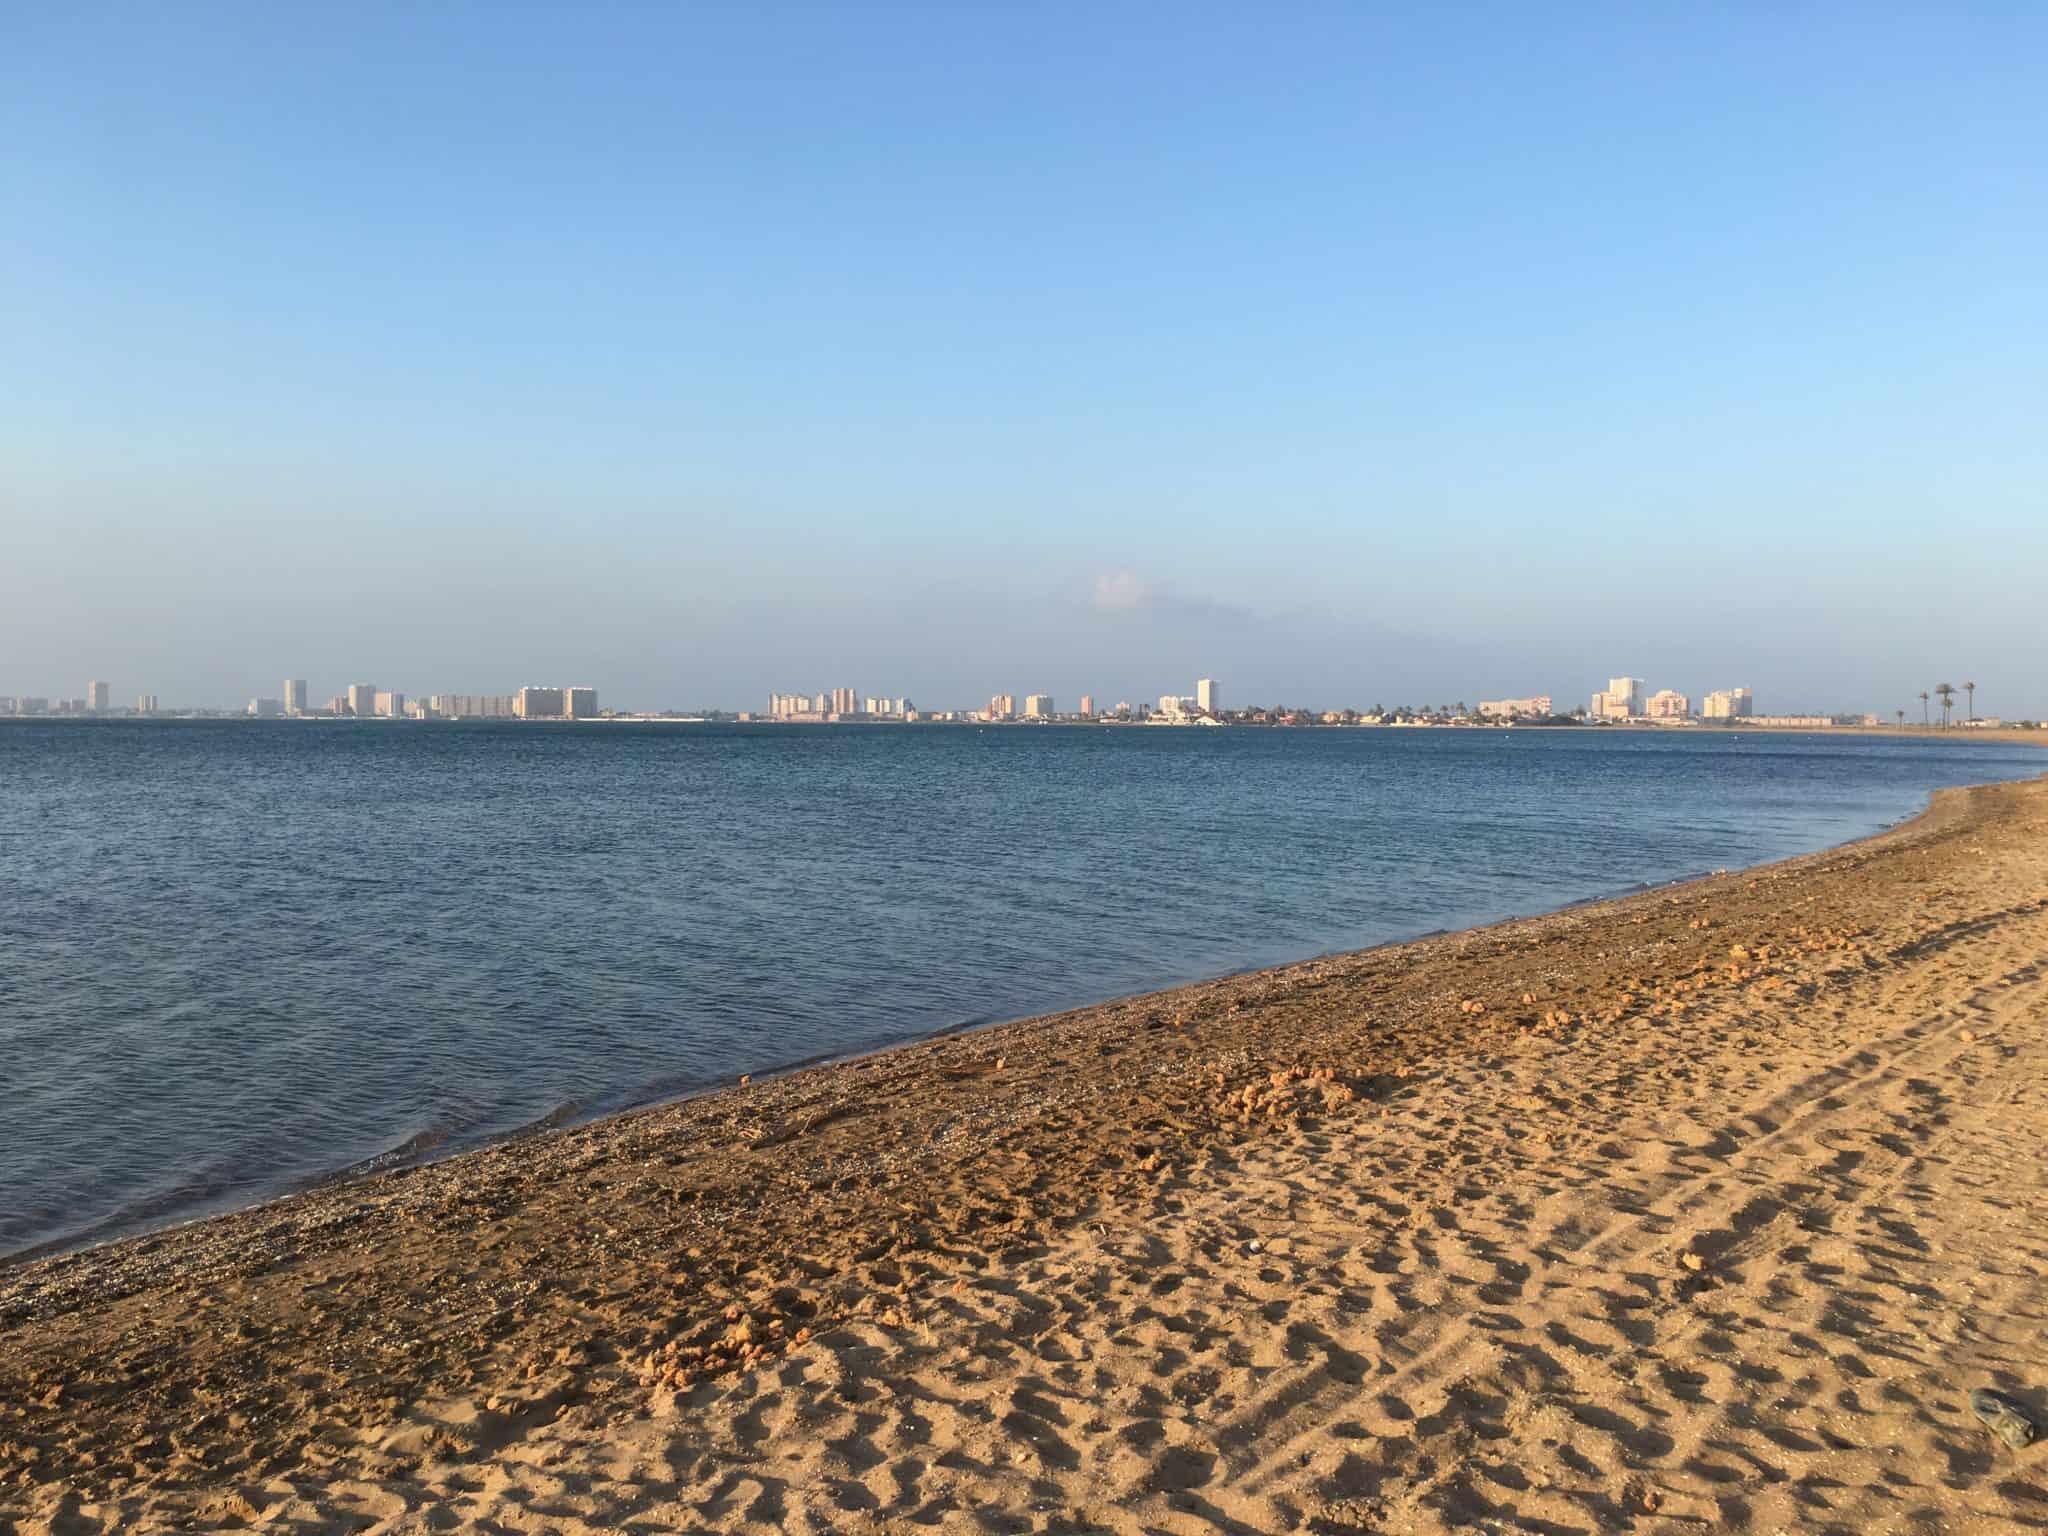 Walking along the beach in Playa Honda